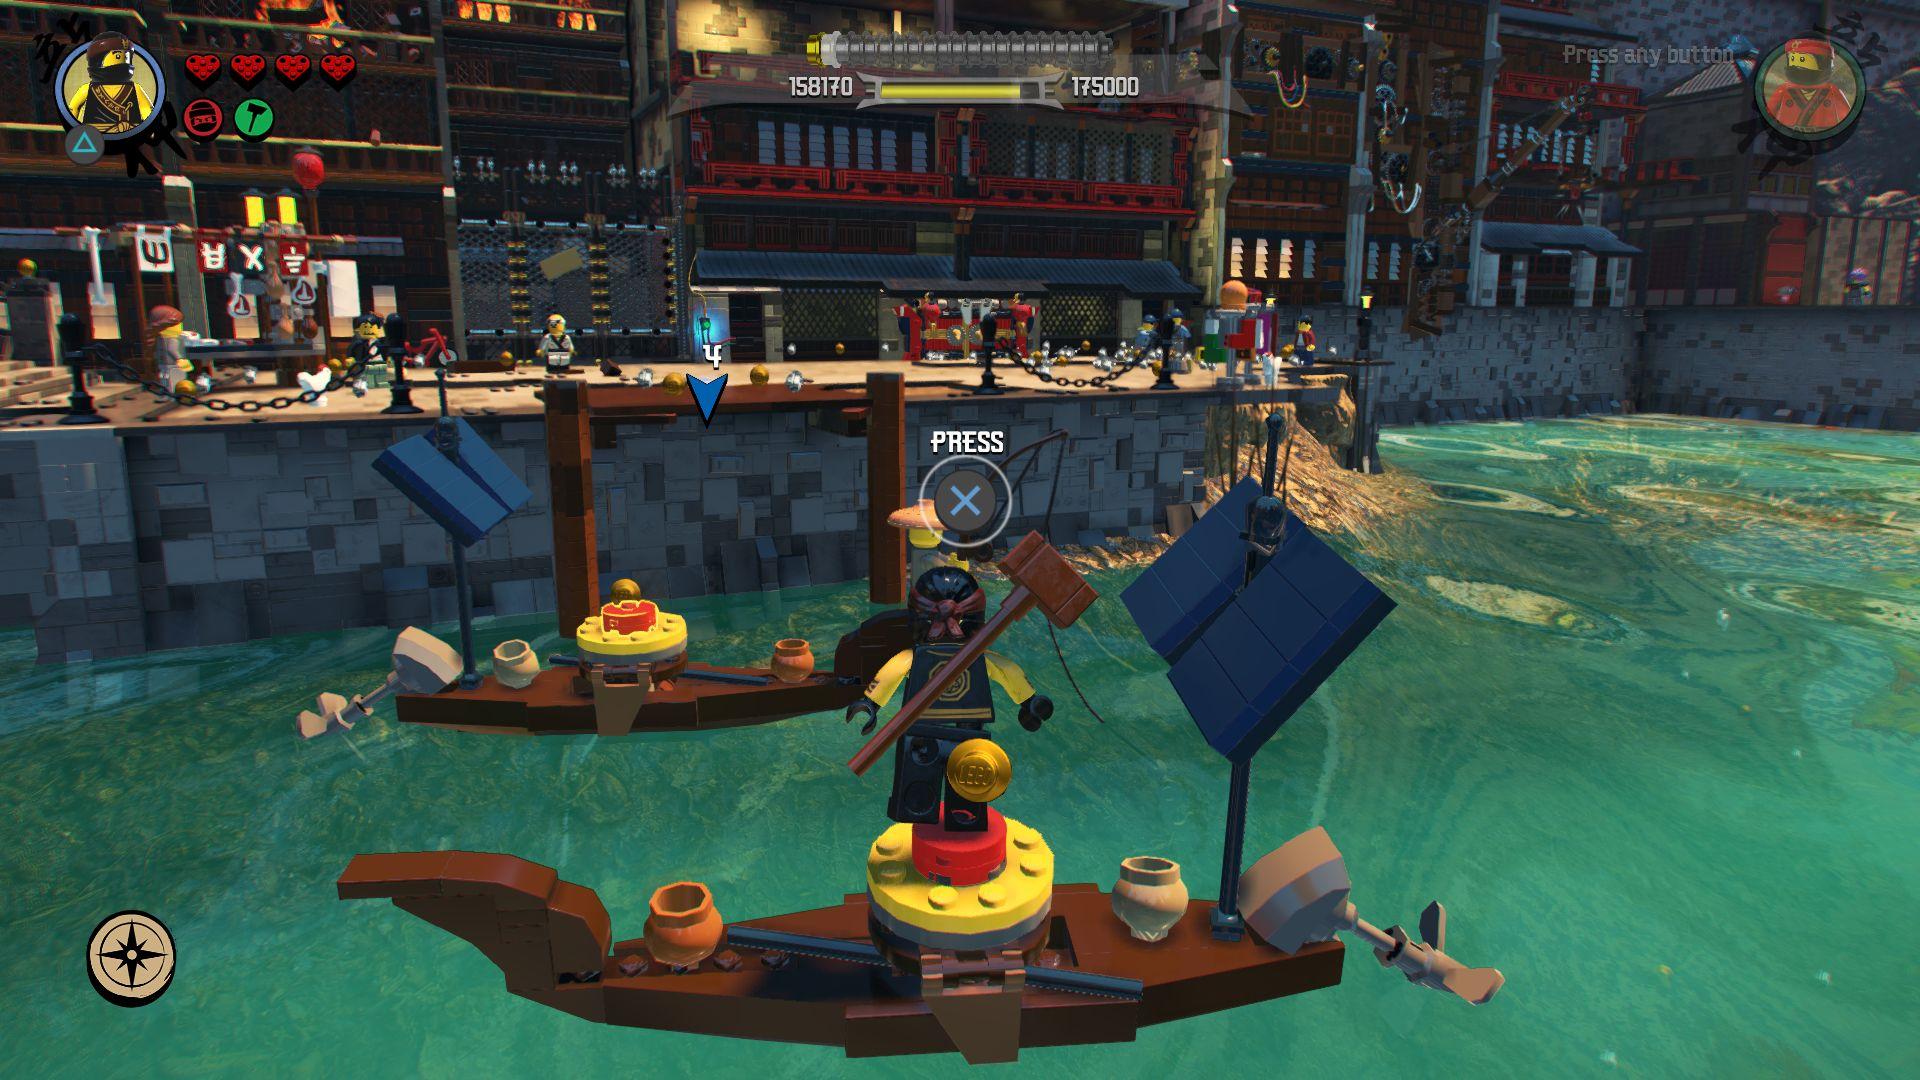 LEGO Ninjago Movie Video Game - jak se legáček nindžou stal 151110